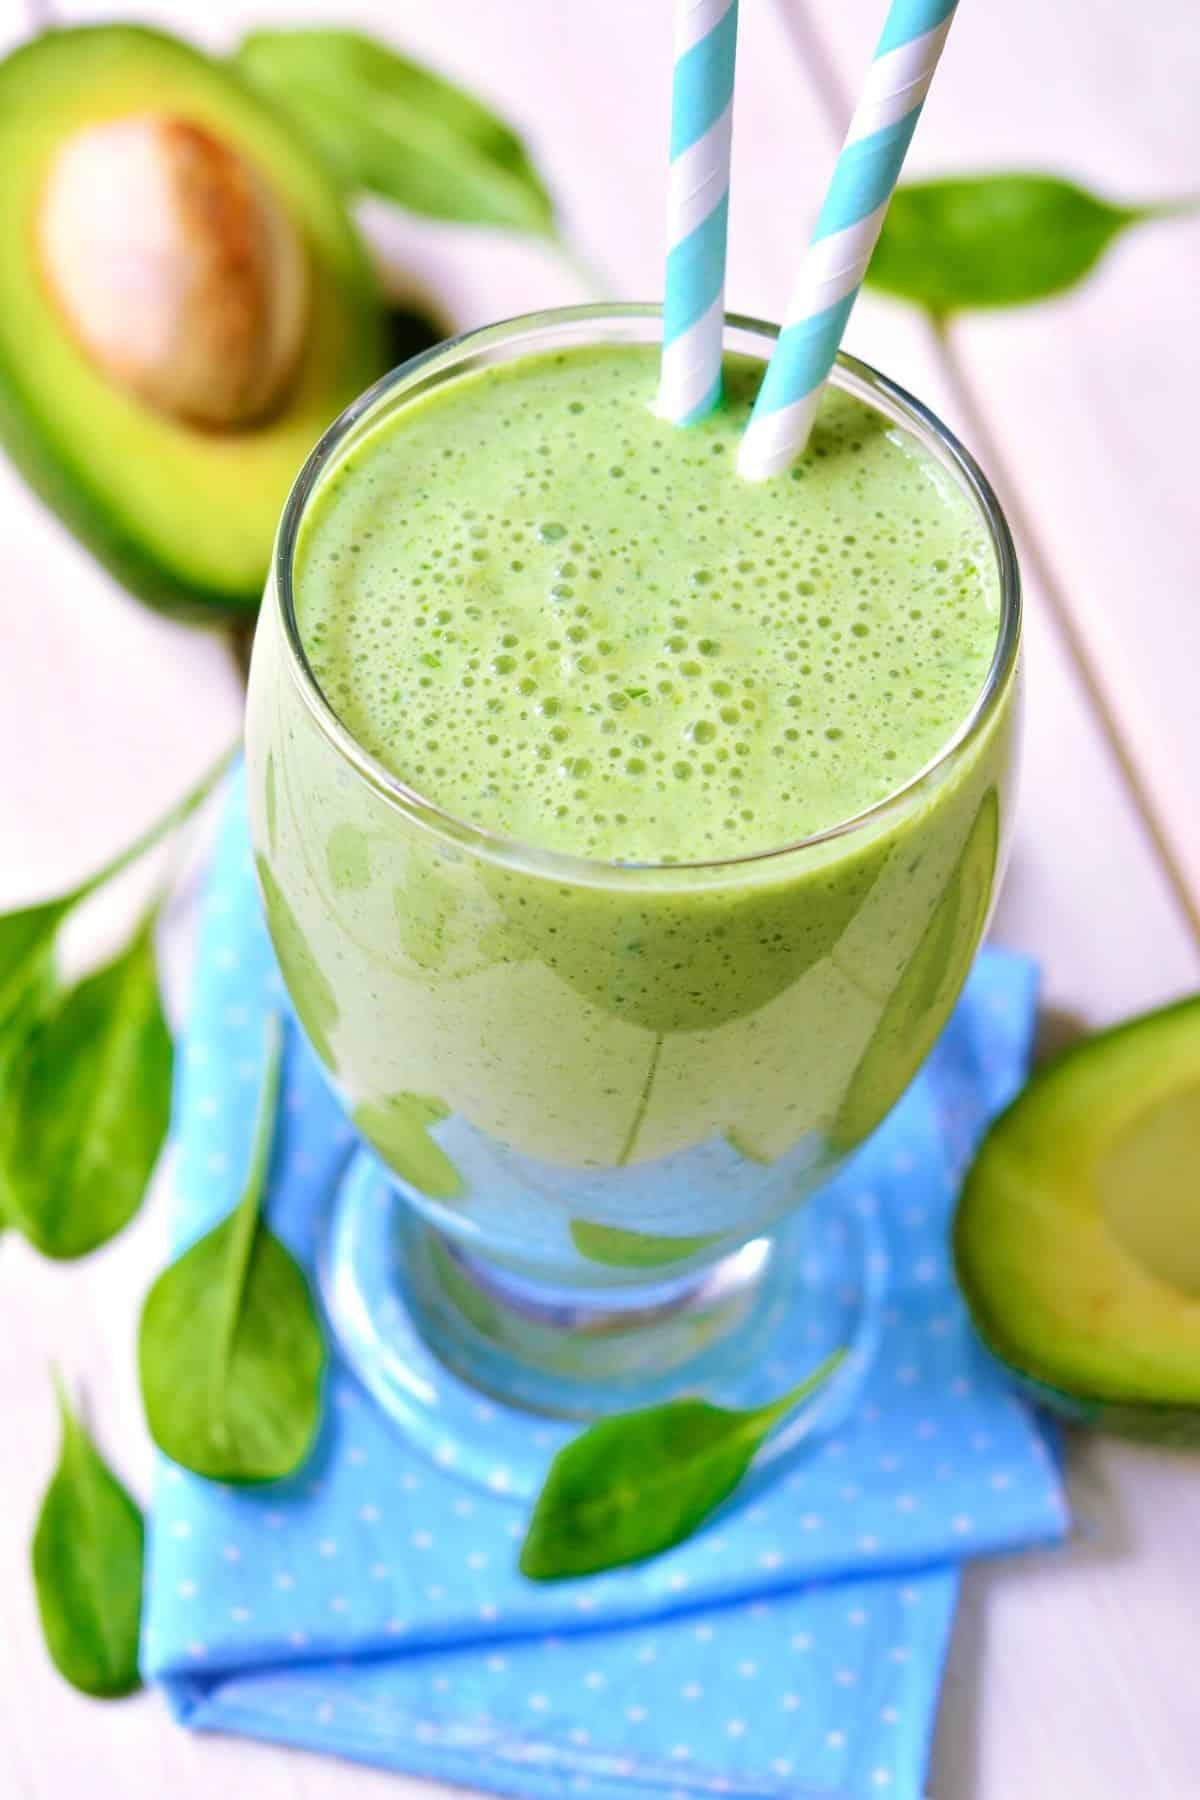 green smoothie made with avocado